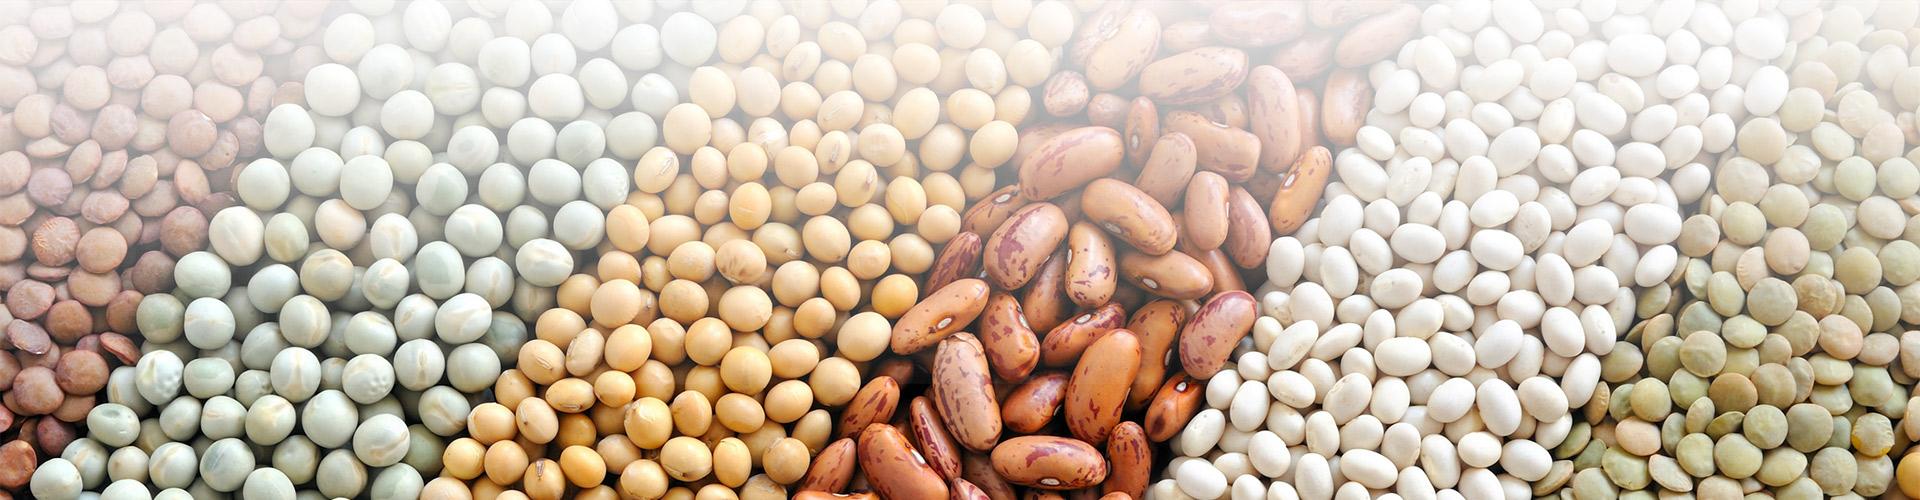 beans banner